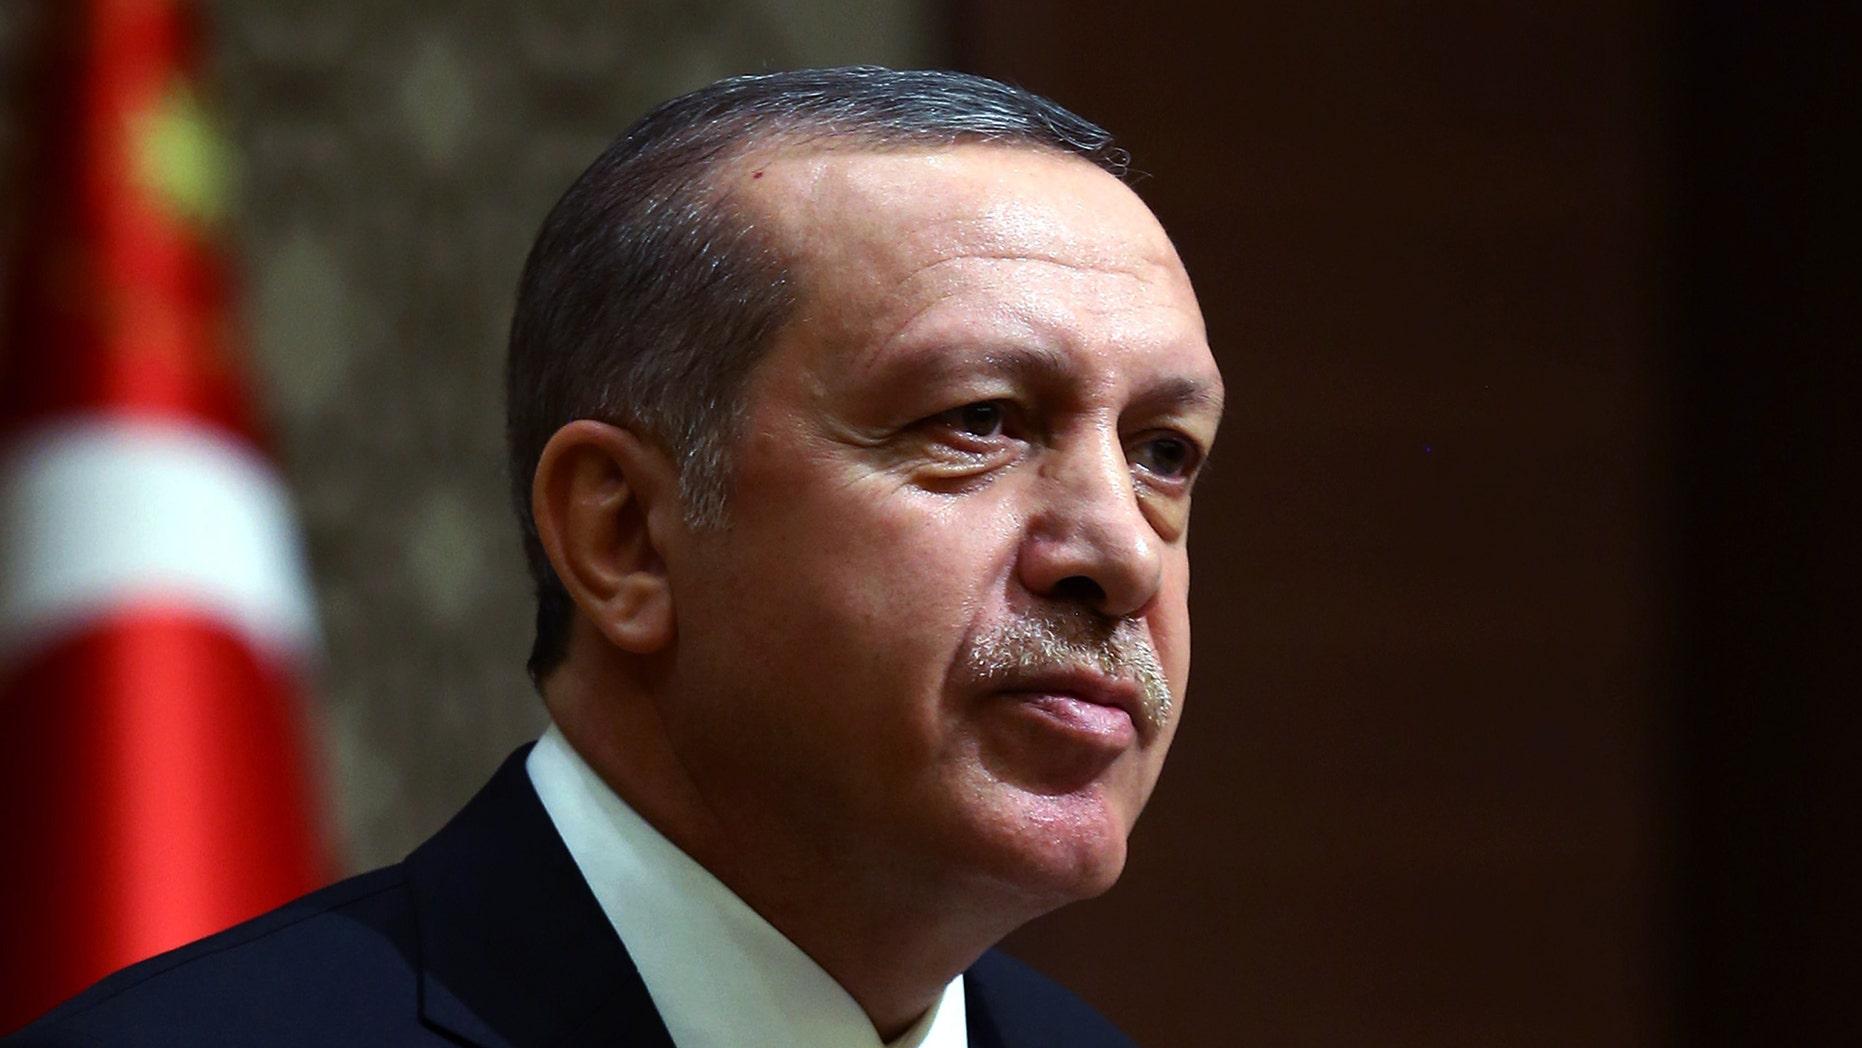 Dec. 12, 2014: Turkey's President Recep Tayyip Erdogan addresses a meeting with business leaders in Ankara, Turkey.